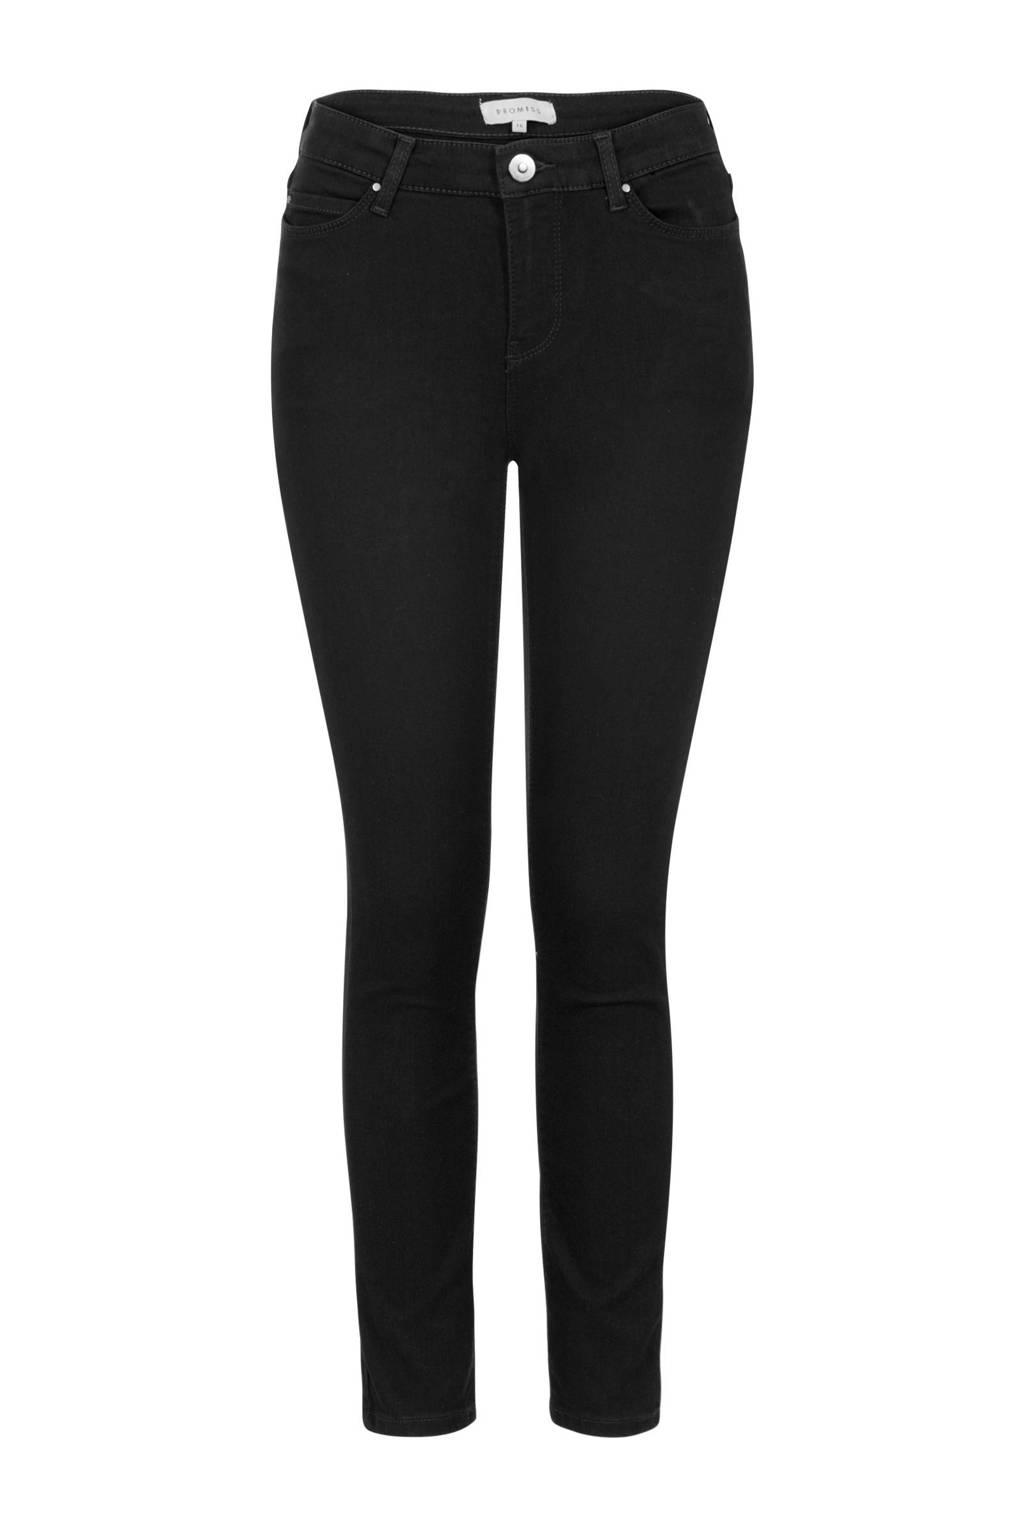 PROMISS skinny jeans zwart, Zwart